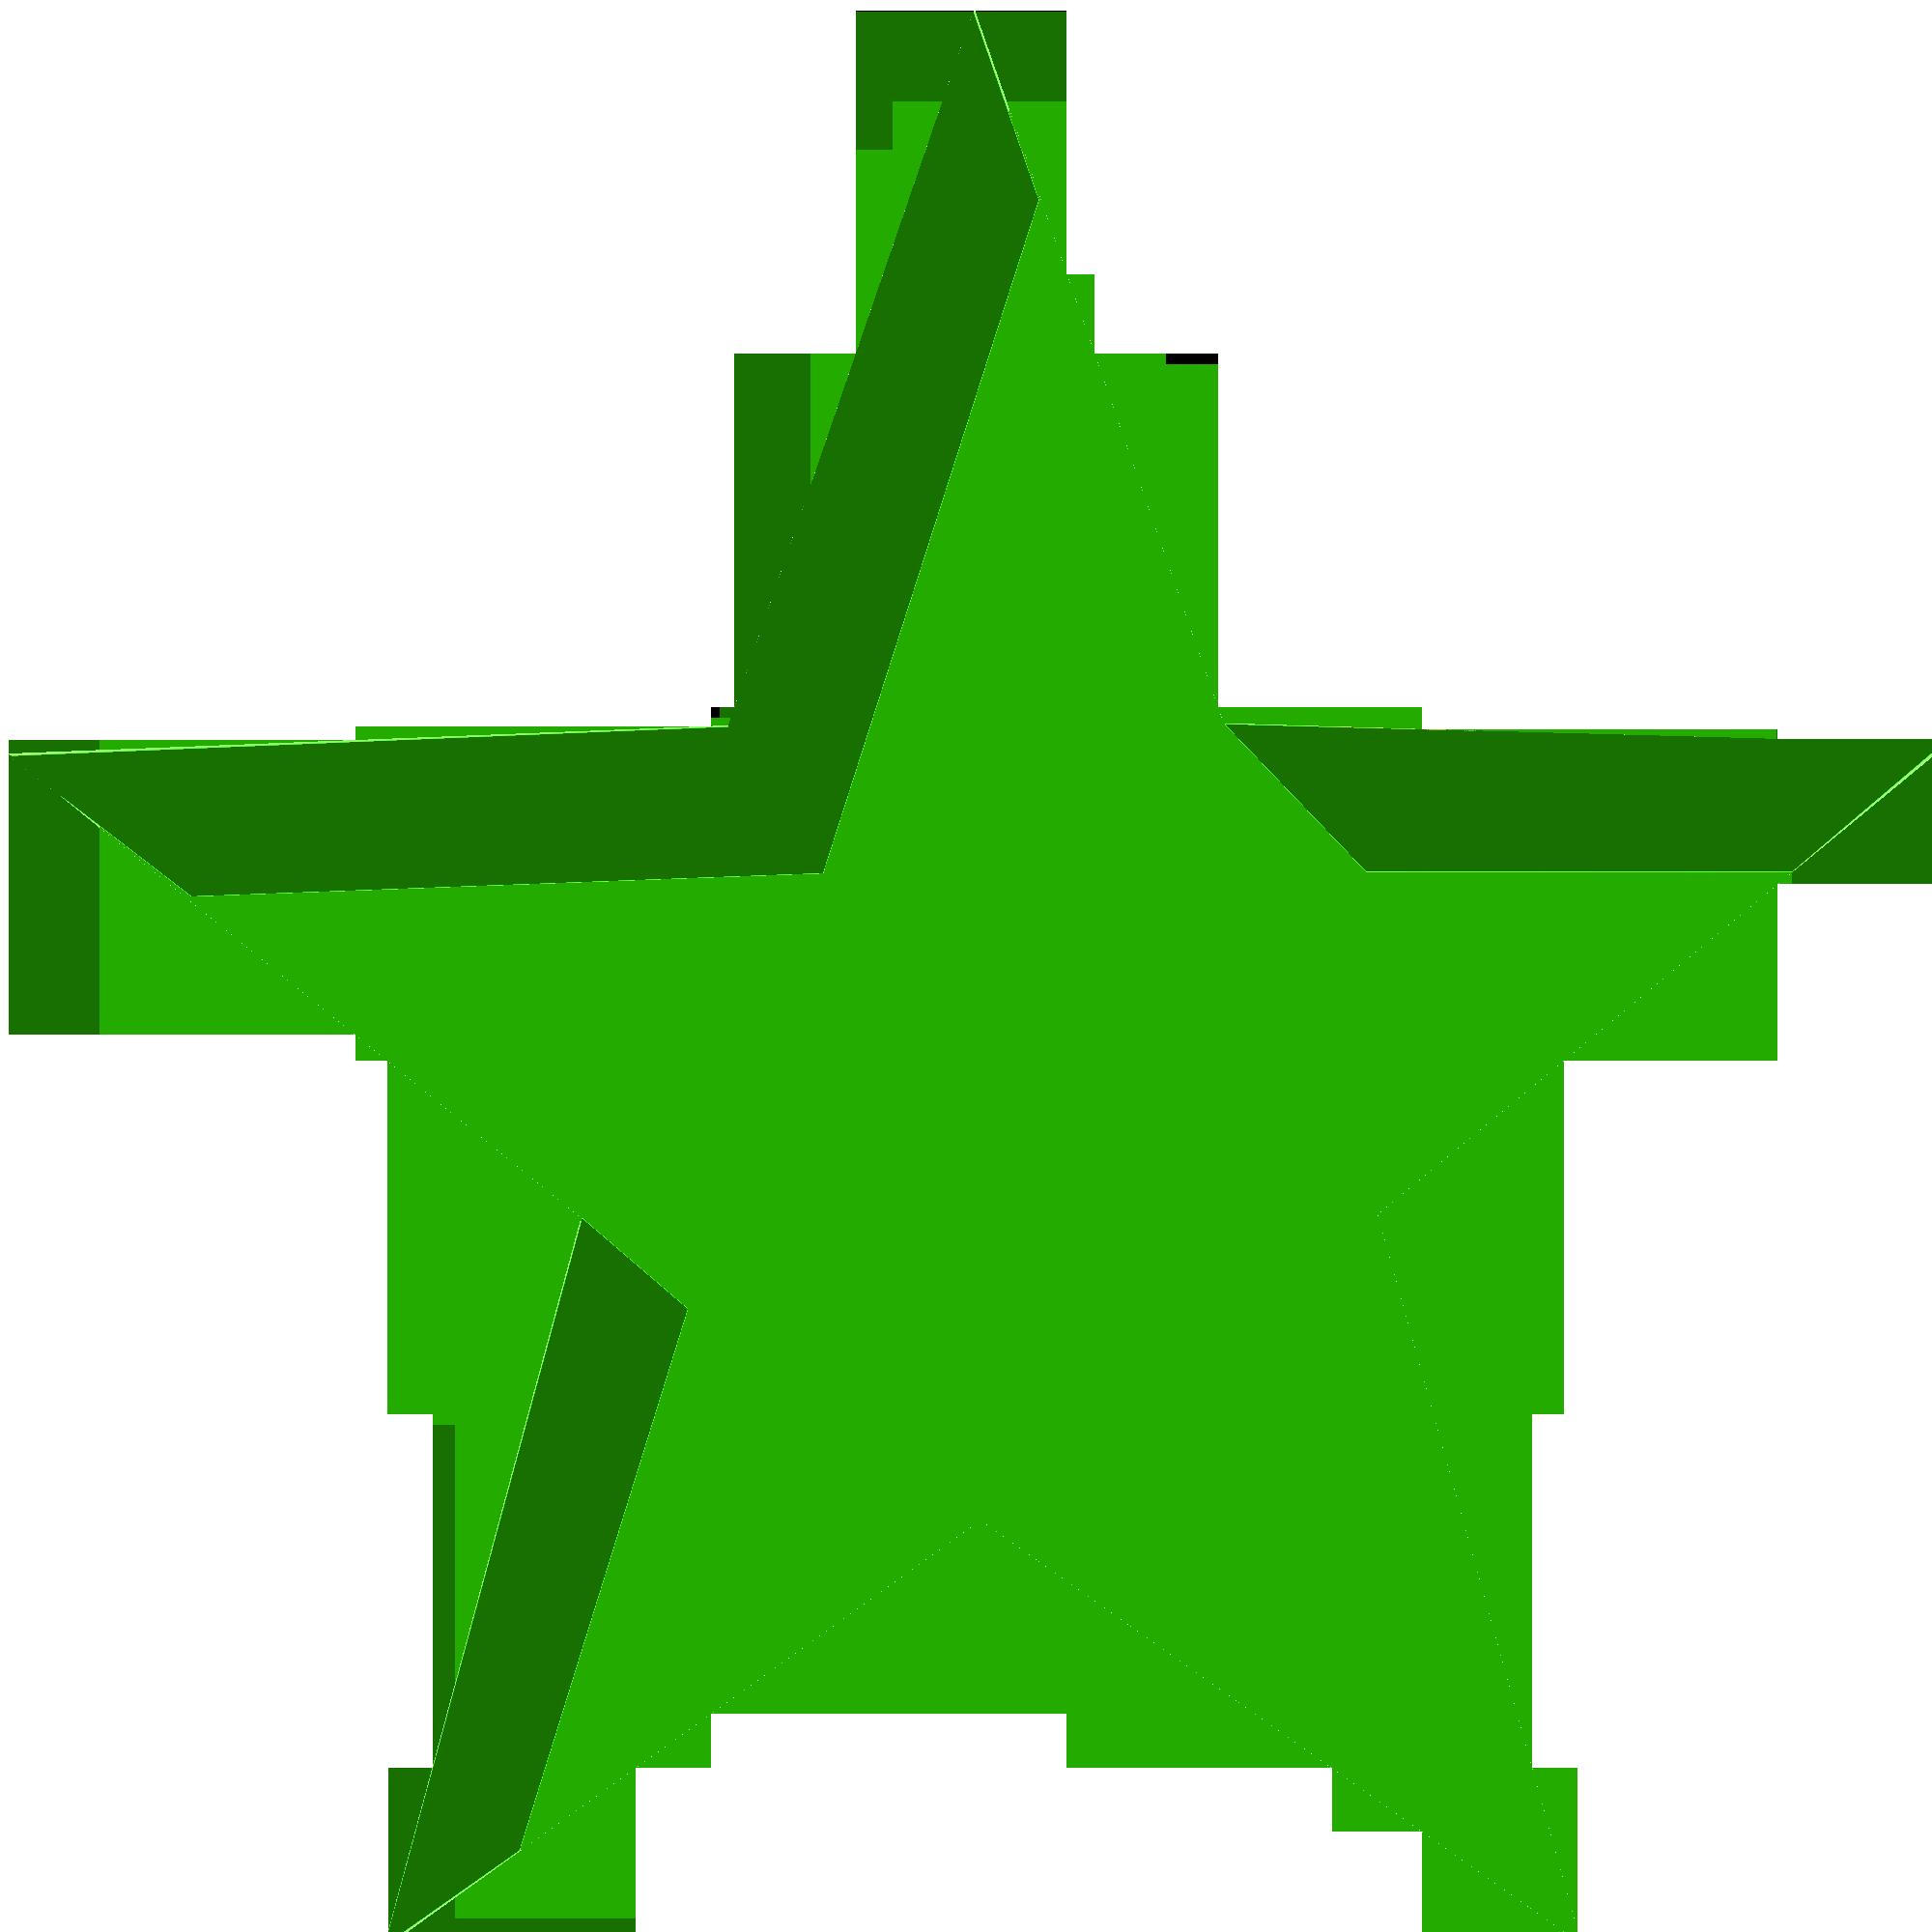 Movie star clipart black and white jpg black and white download ➡➡ Star Black And White Clip Art Images Download jpg black and white download